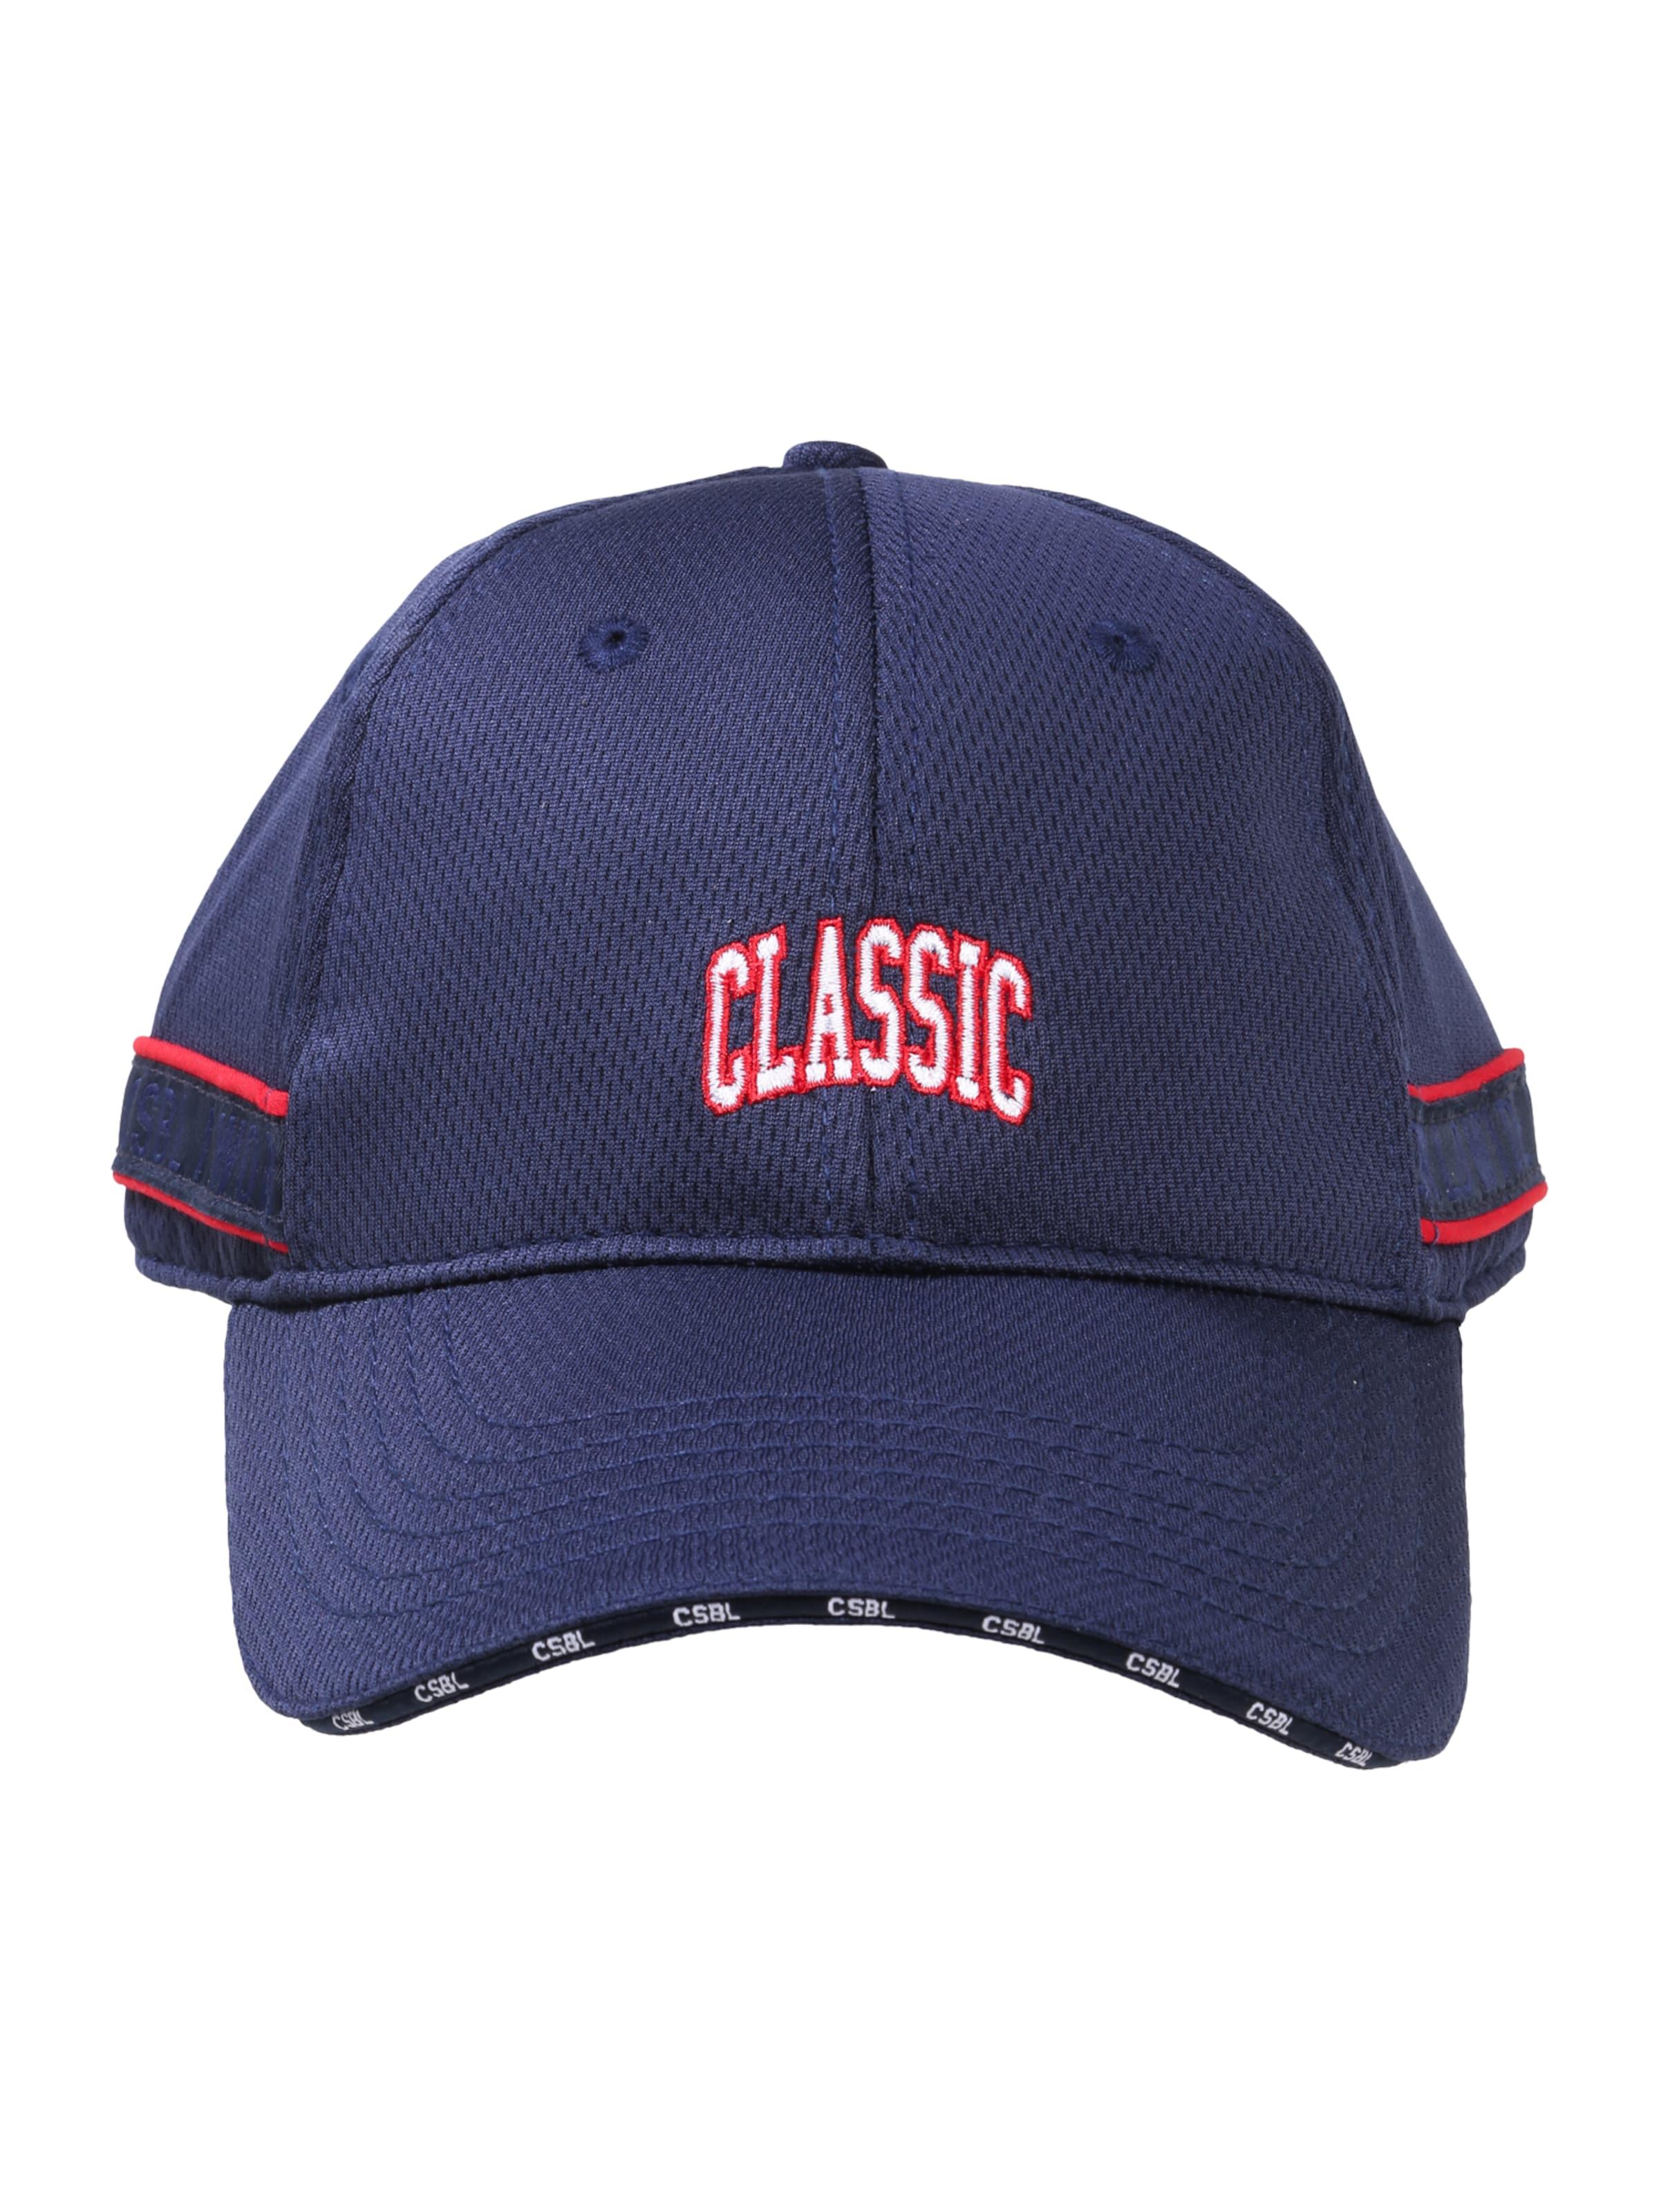 Cayler & Sons Cap 'Worldwide Classic' Ansehen Günstig Online Rabatt 2018 Rabatt-Codes Online-Shopping Erstaunlicher Preis Online Aaa Qualität Igja4K6p